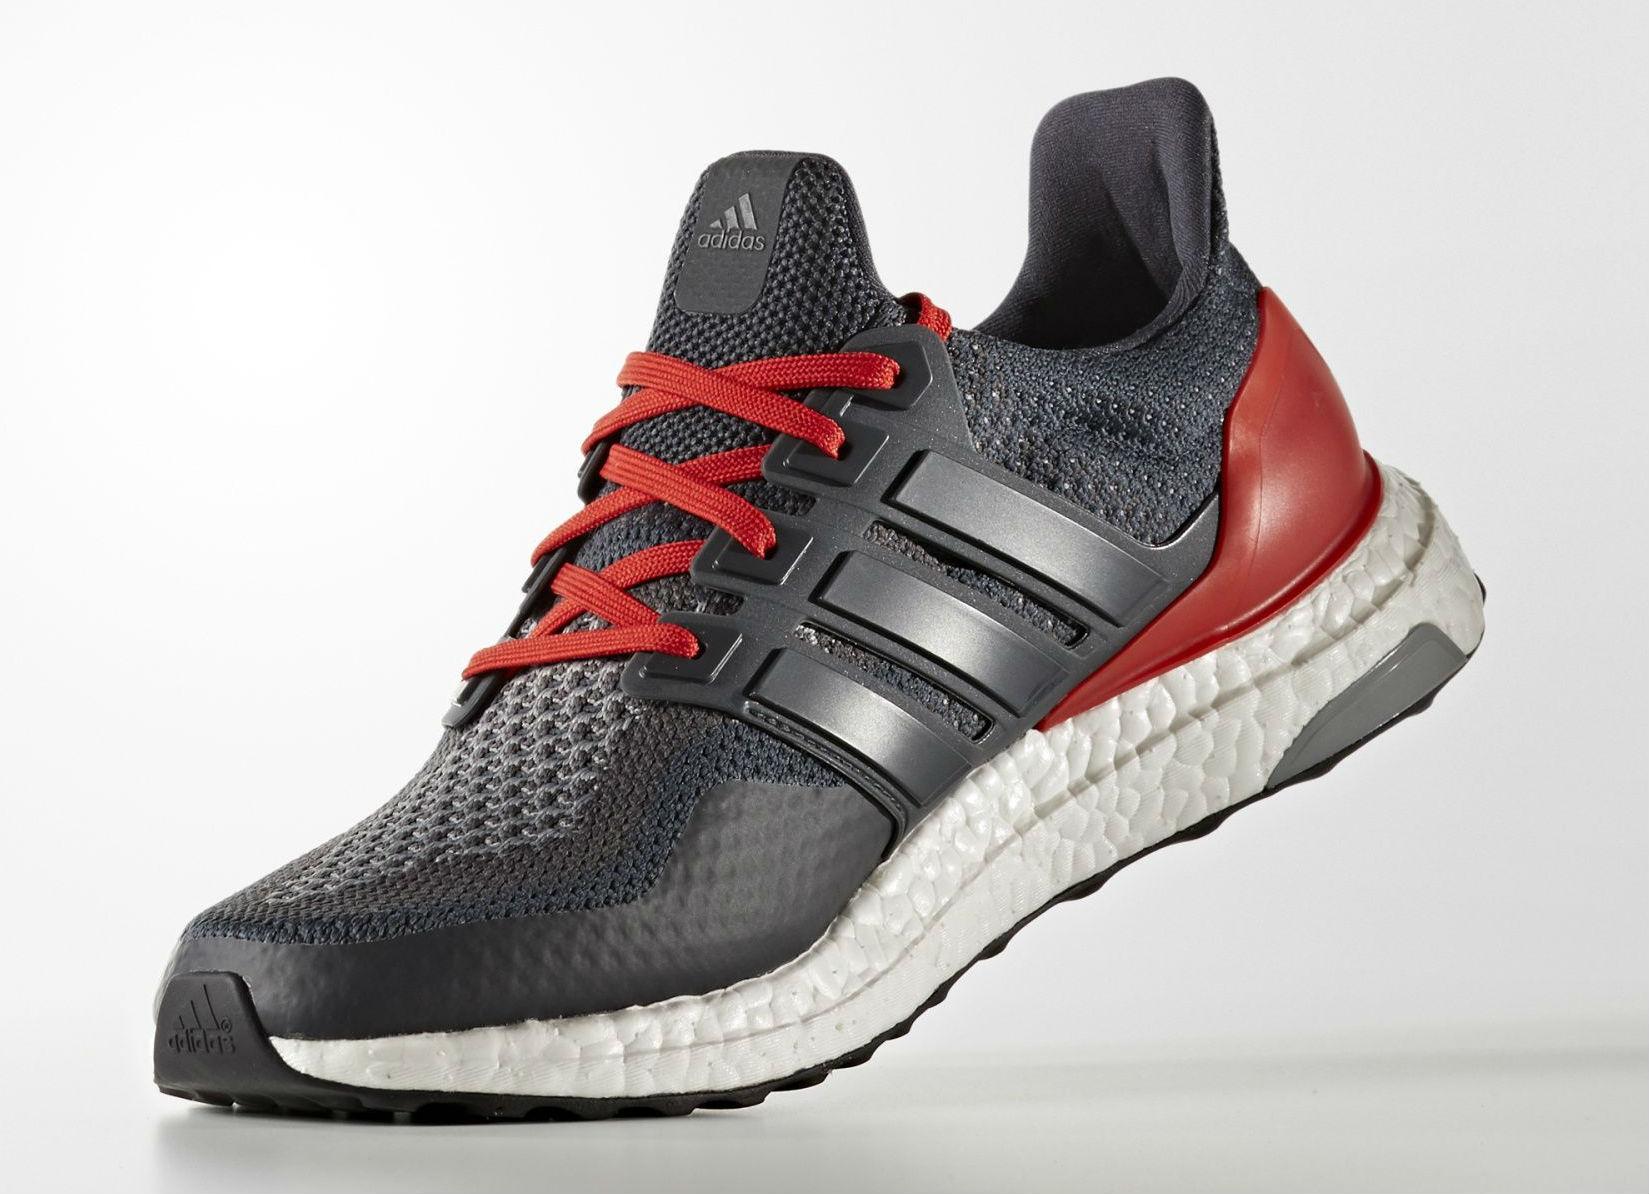 Adidas Ultra Boost Black Red